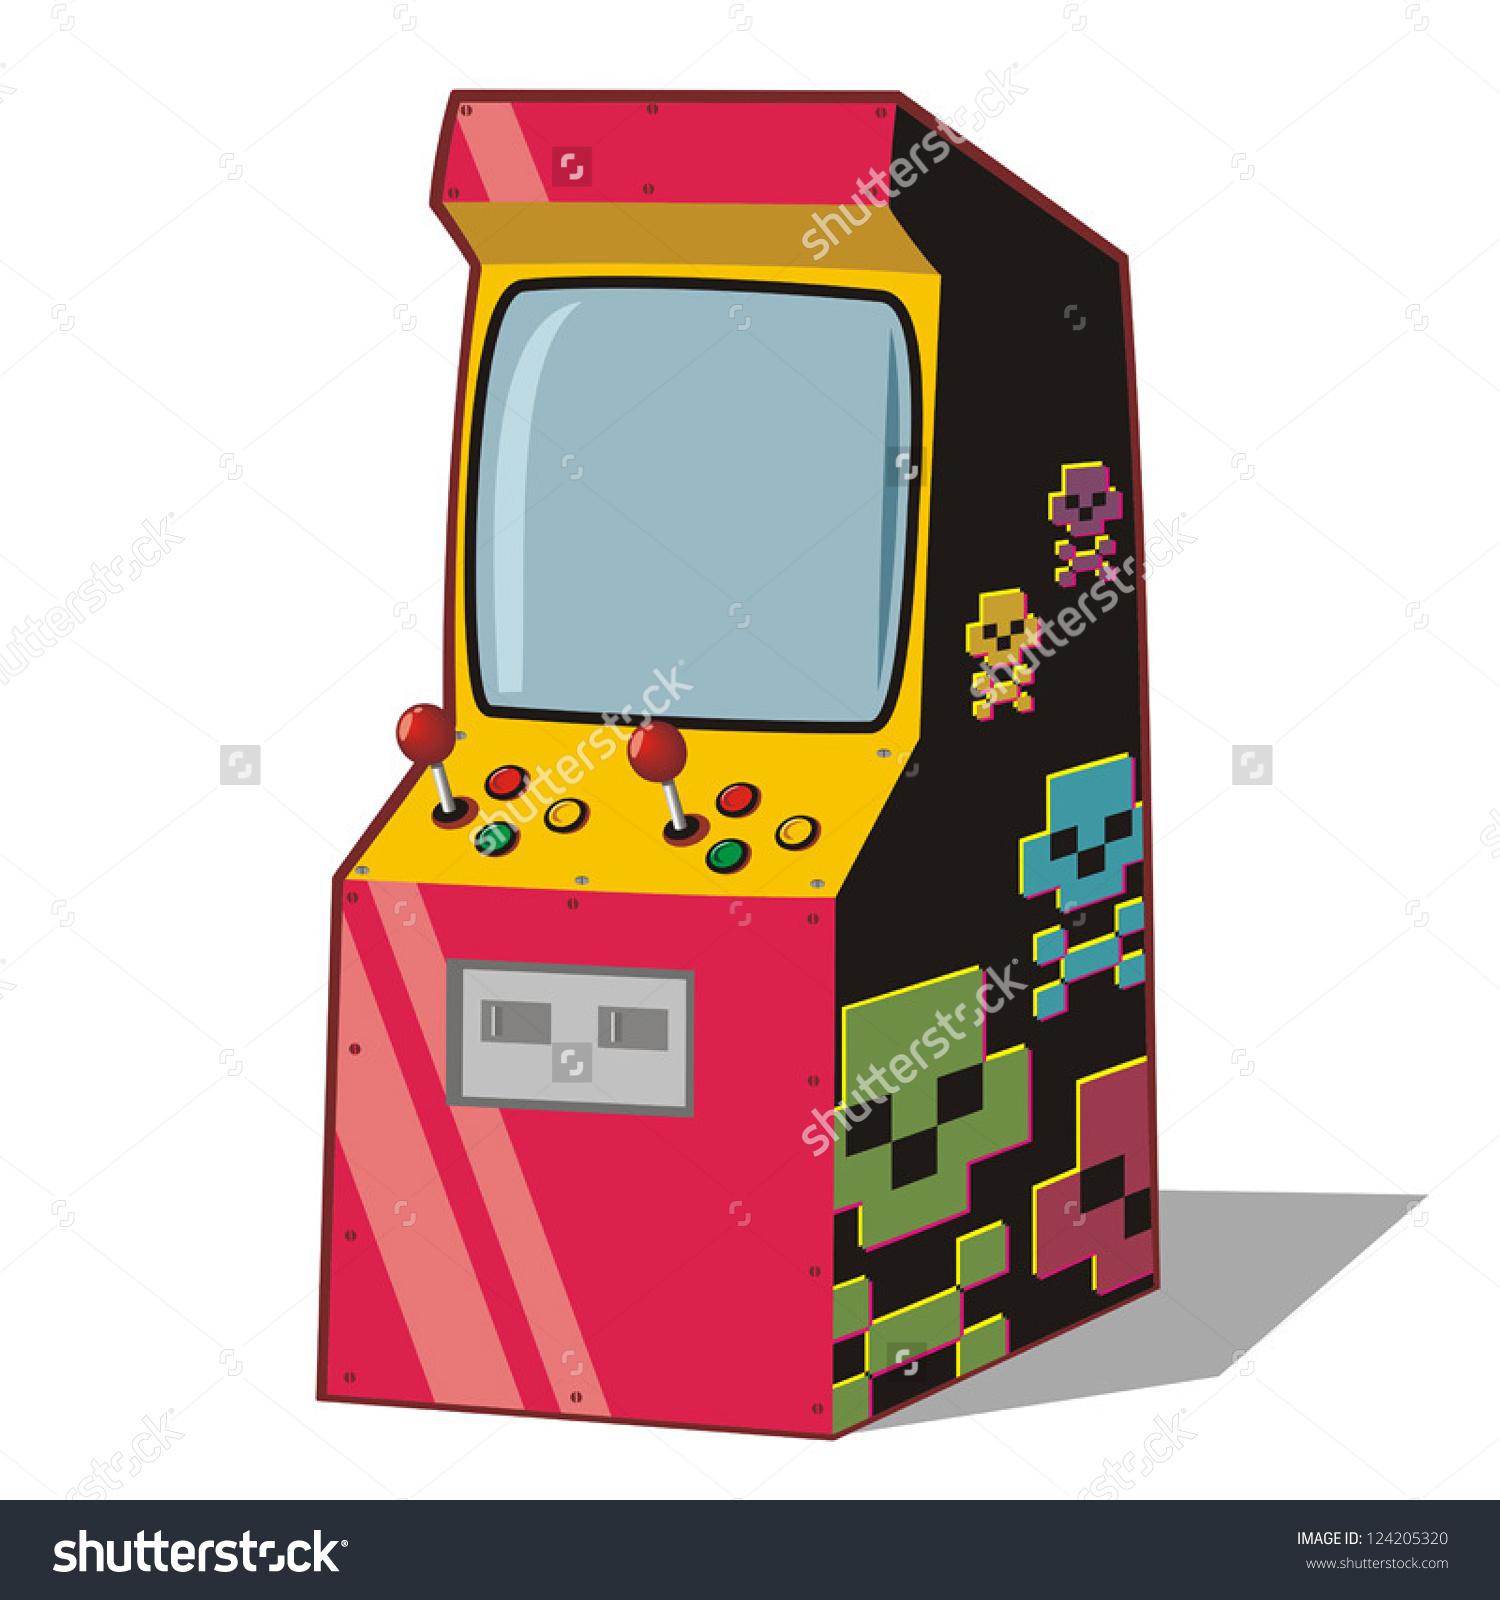 jpg free stock Arcade clipart cartoon. Free download best on